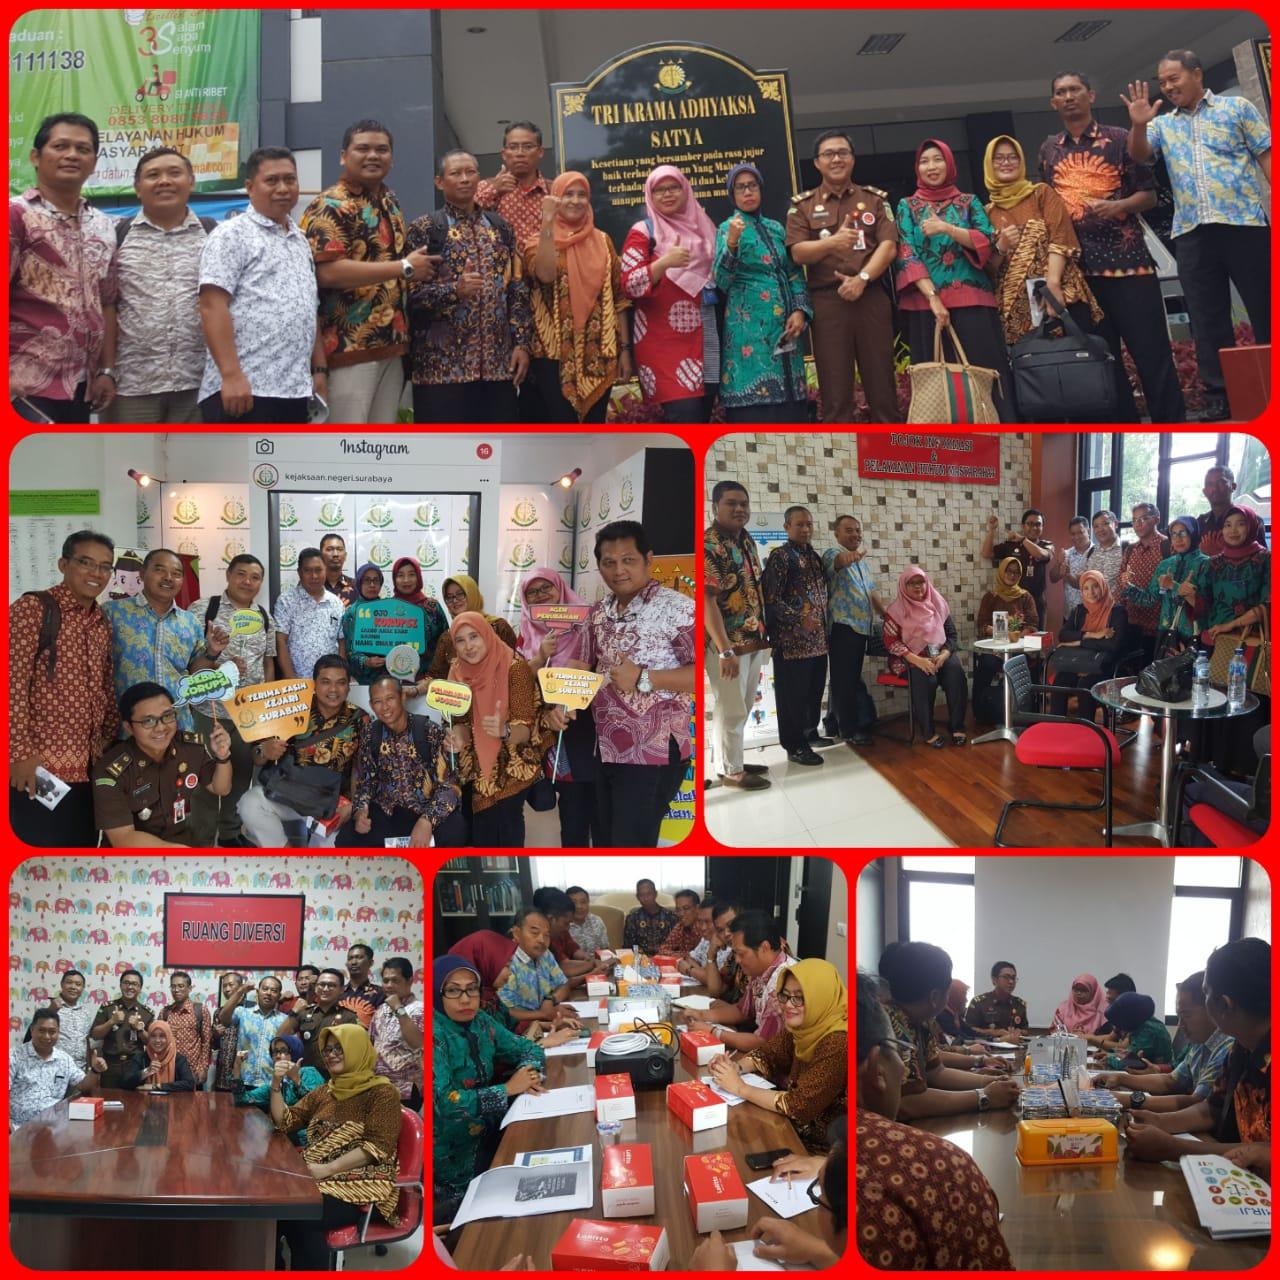 Kunjungan Diklat Terpadu SPPA Di Kejaksaan Negeri Surabaya 27-11-2018